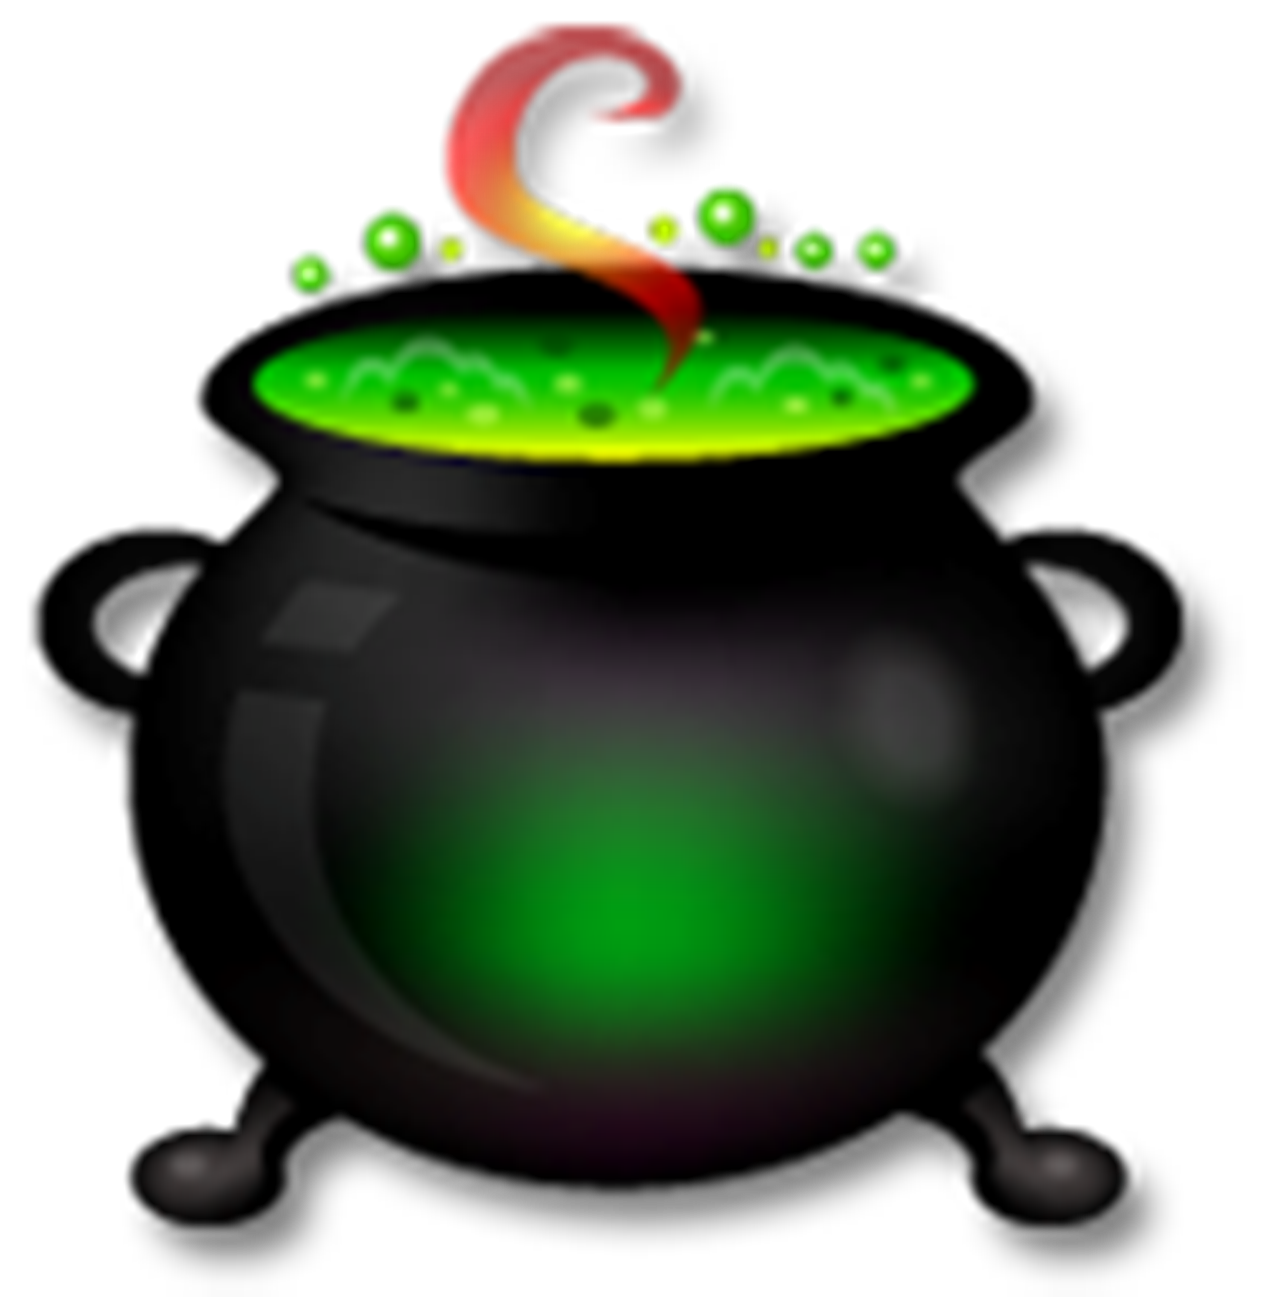 Cauldron clipart 3